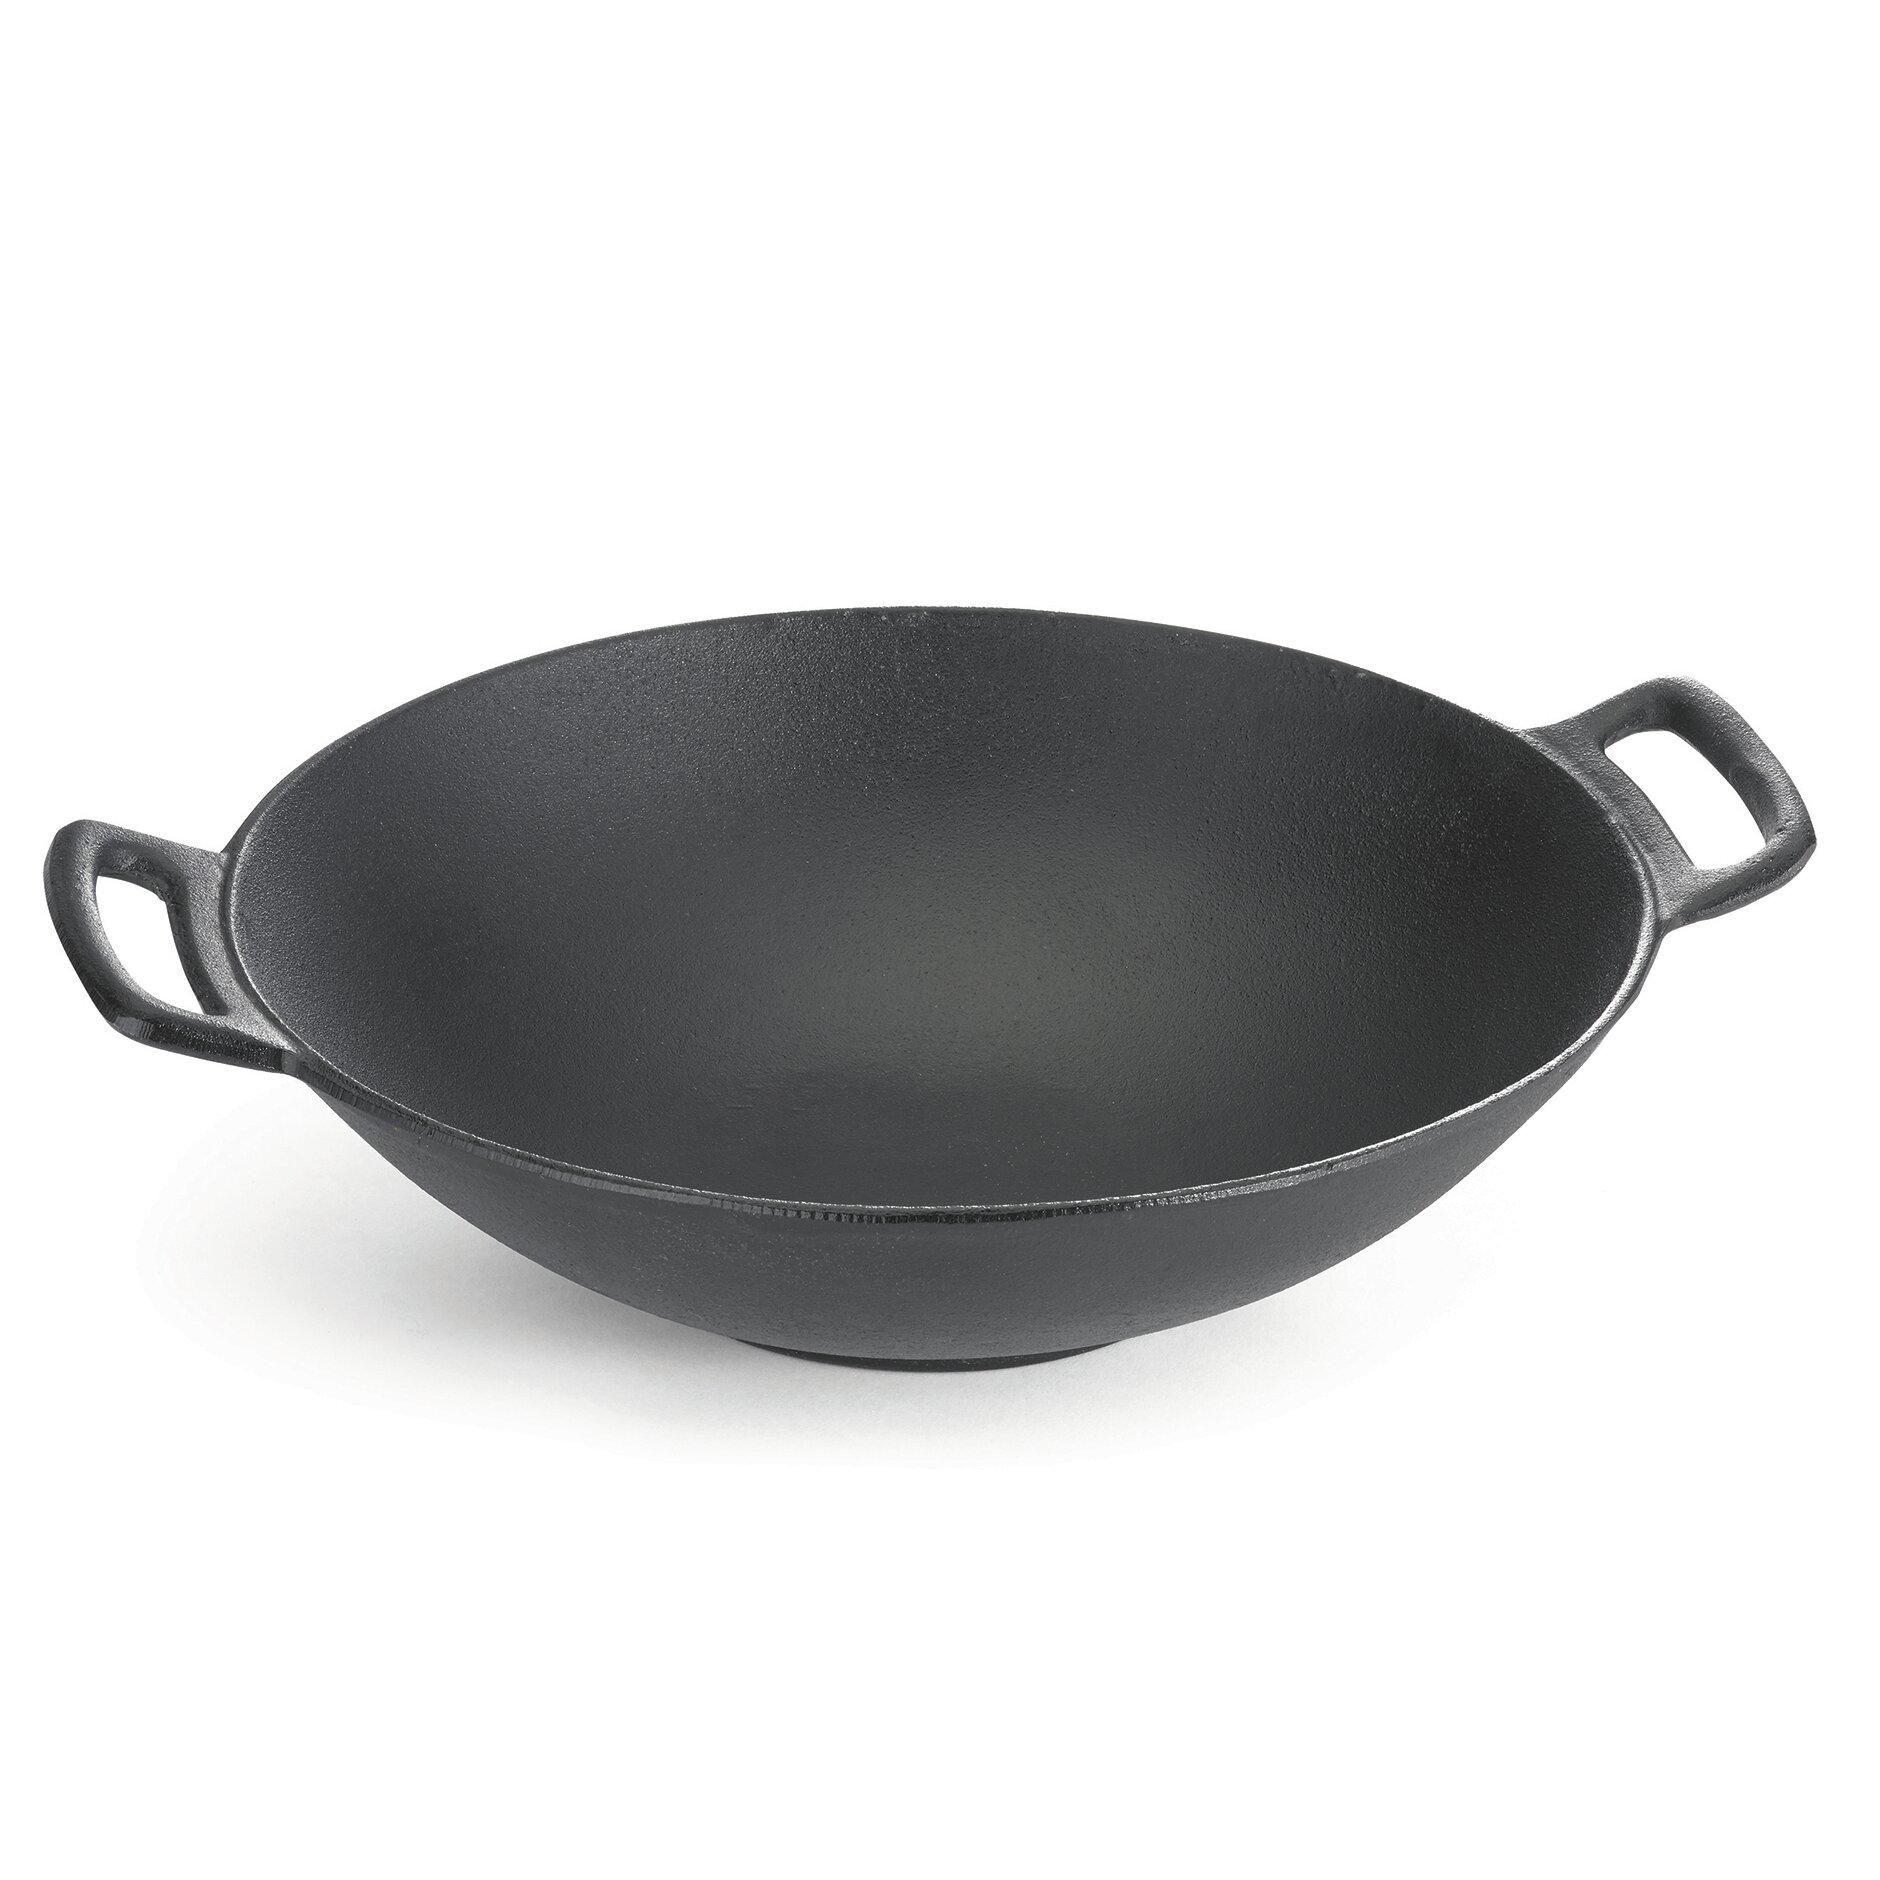 Casserole Induction Compatible Vitroceramique tablecraft 14 in. cast iron wok